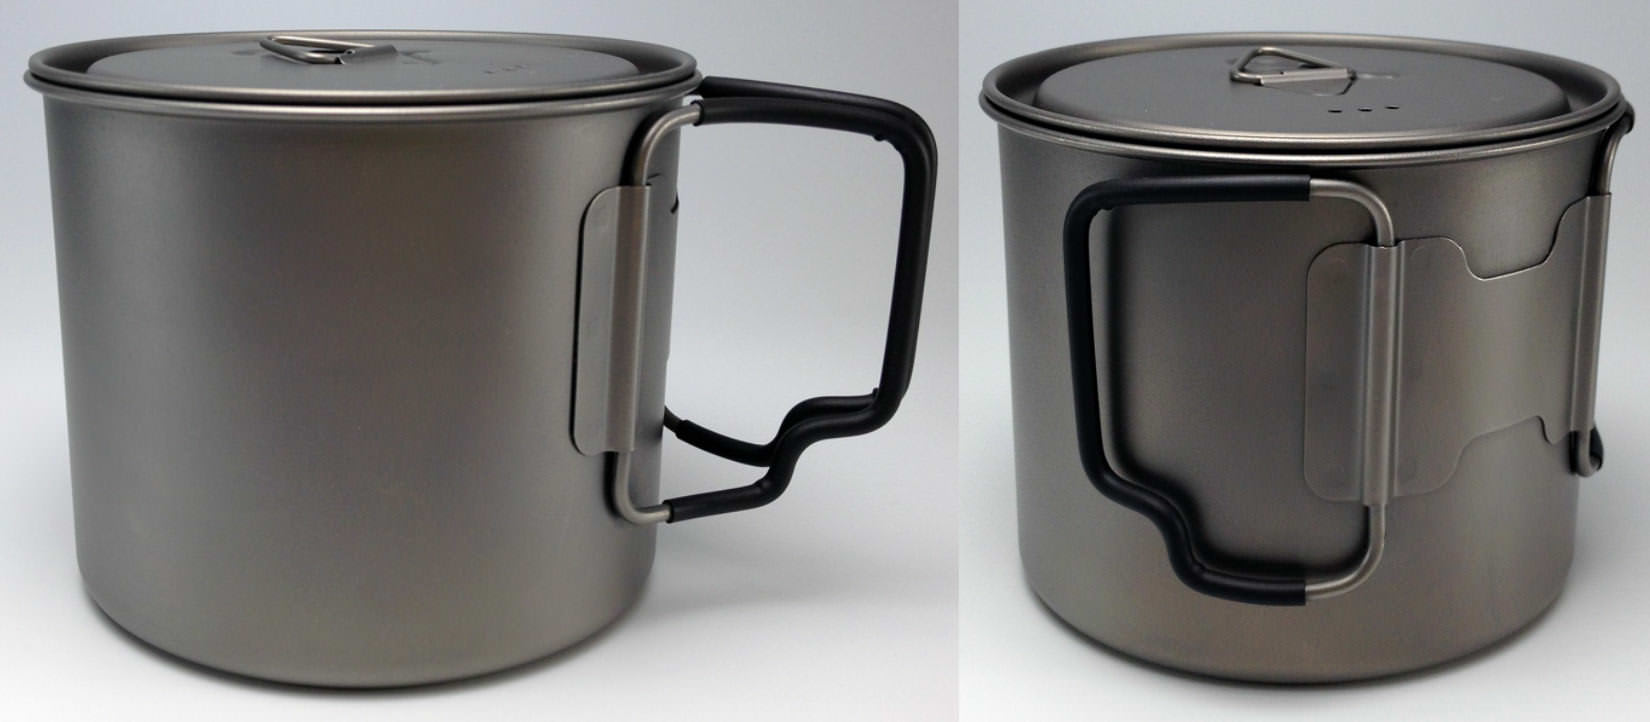 Titanium Cookpot with Lid 550 mL